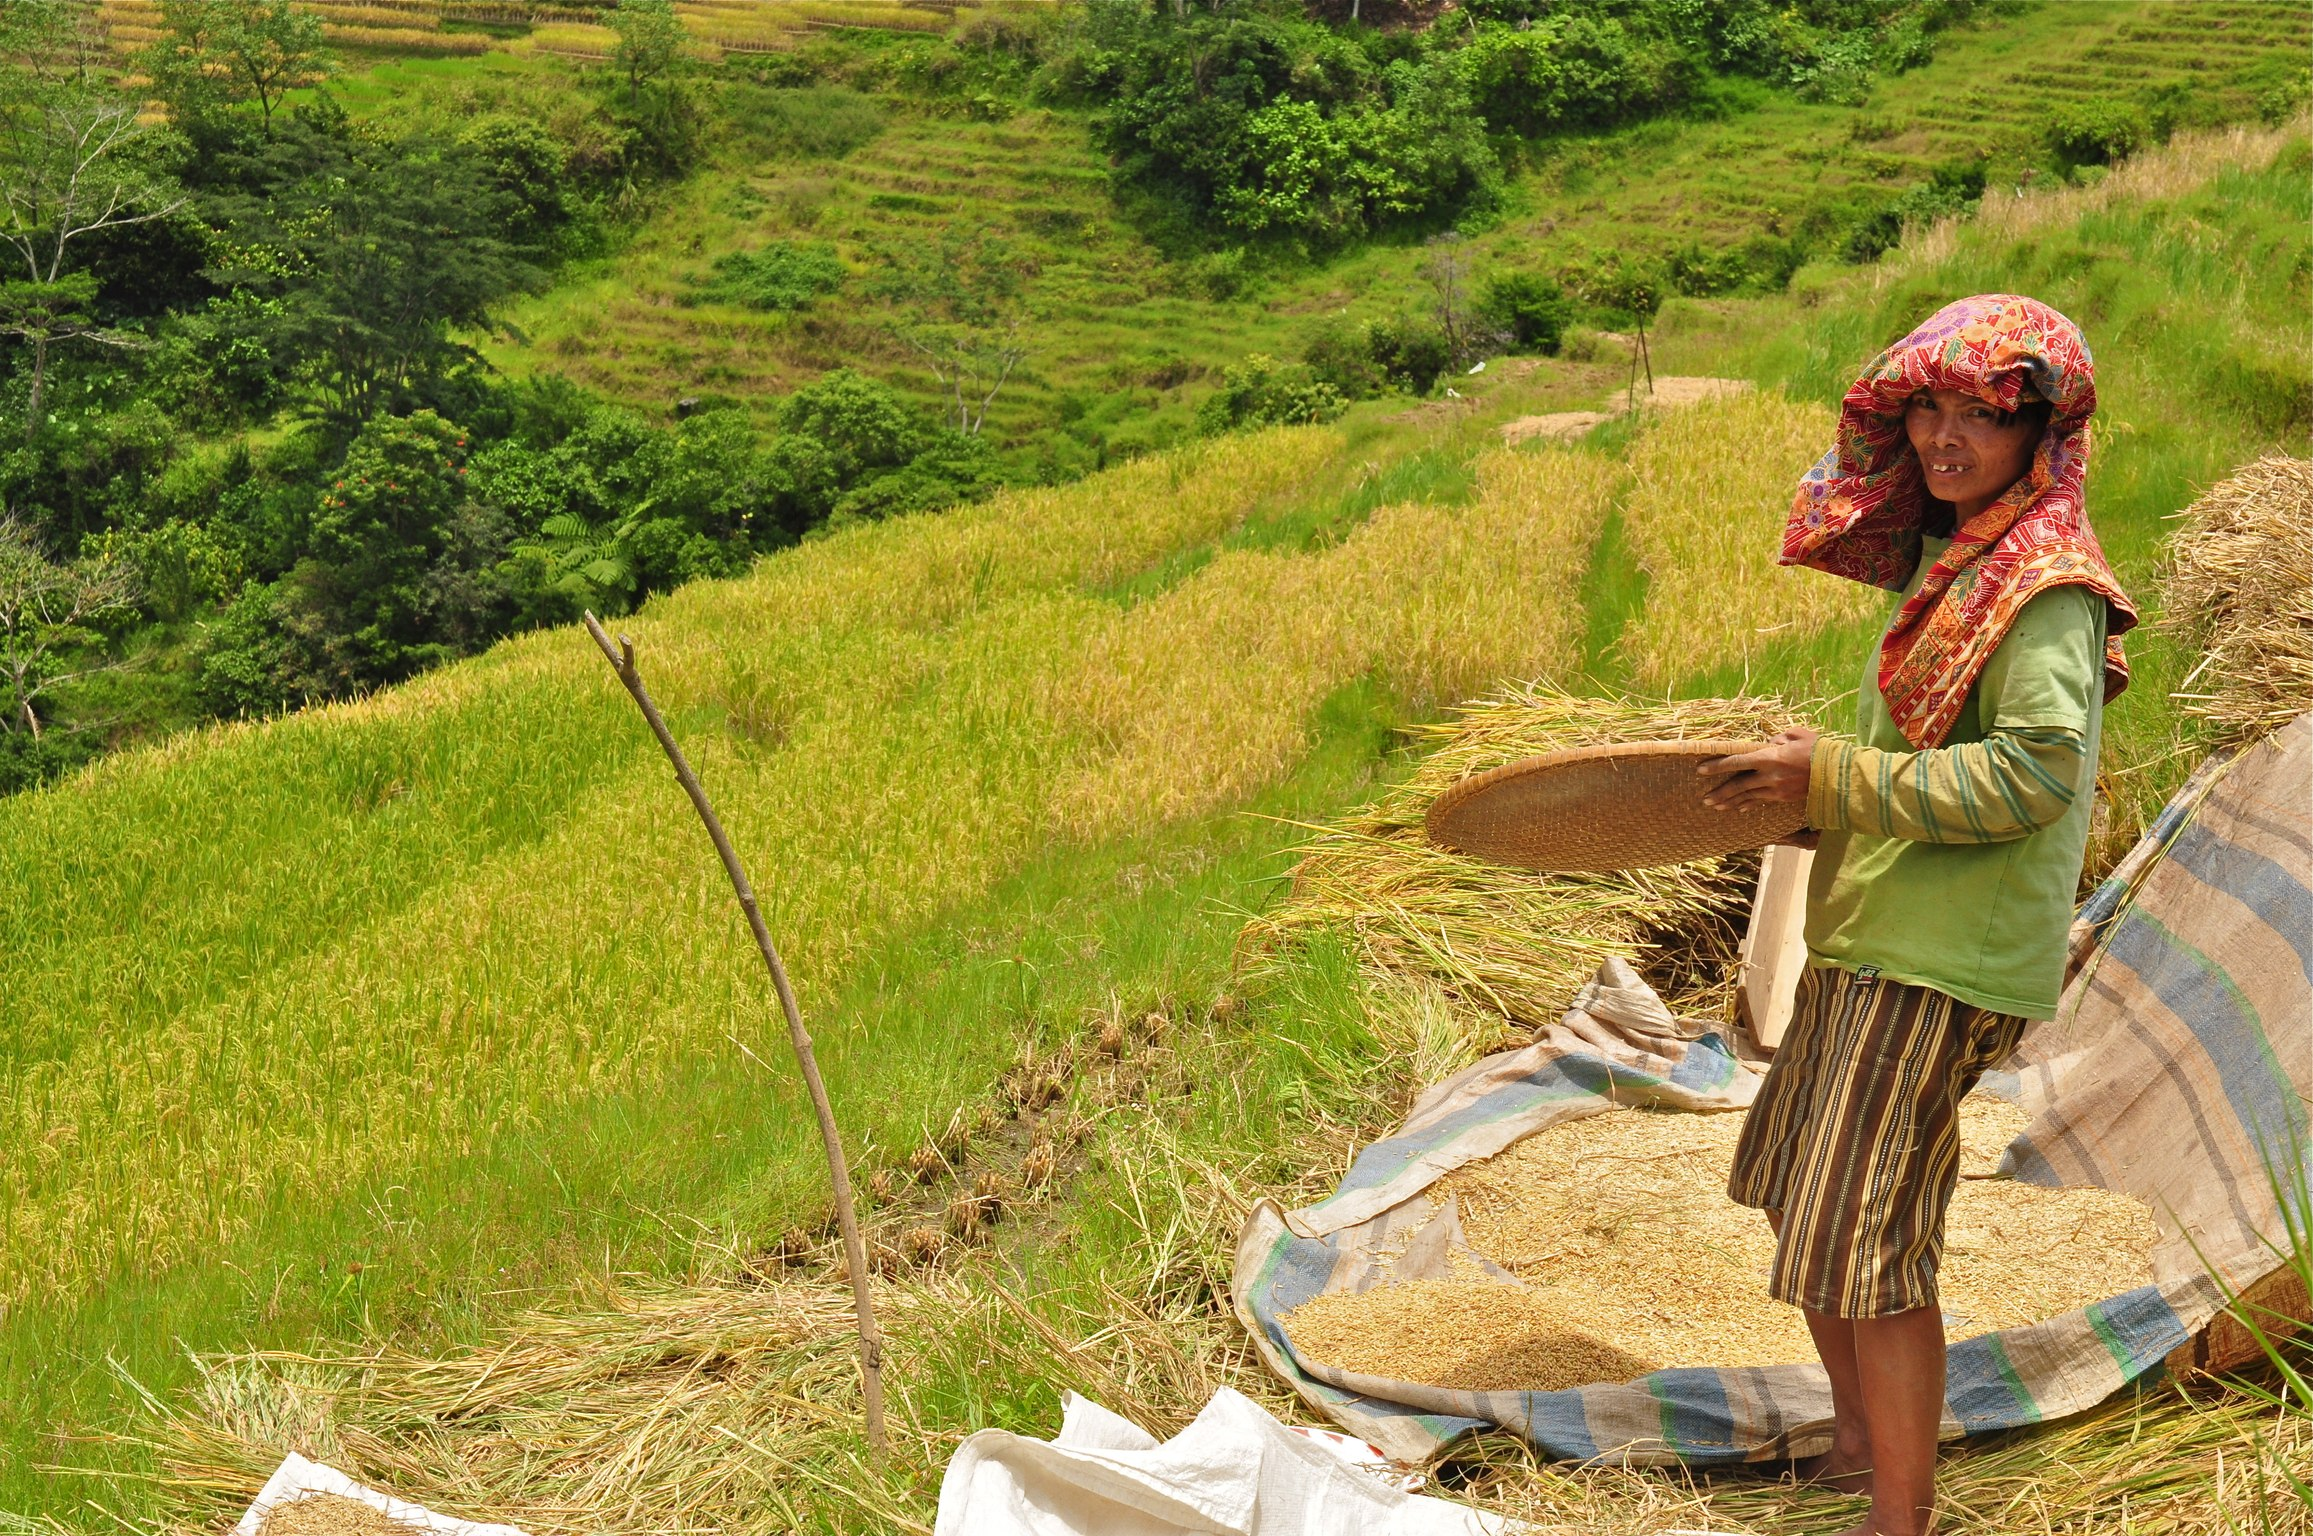 Mahasiswa Teknik Lingkungan, Mari Terjun Membangun Desa dengan Program Holistik Pembinaan  dan Pemberdayaan Desa (PHP2D)